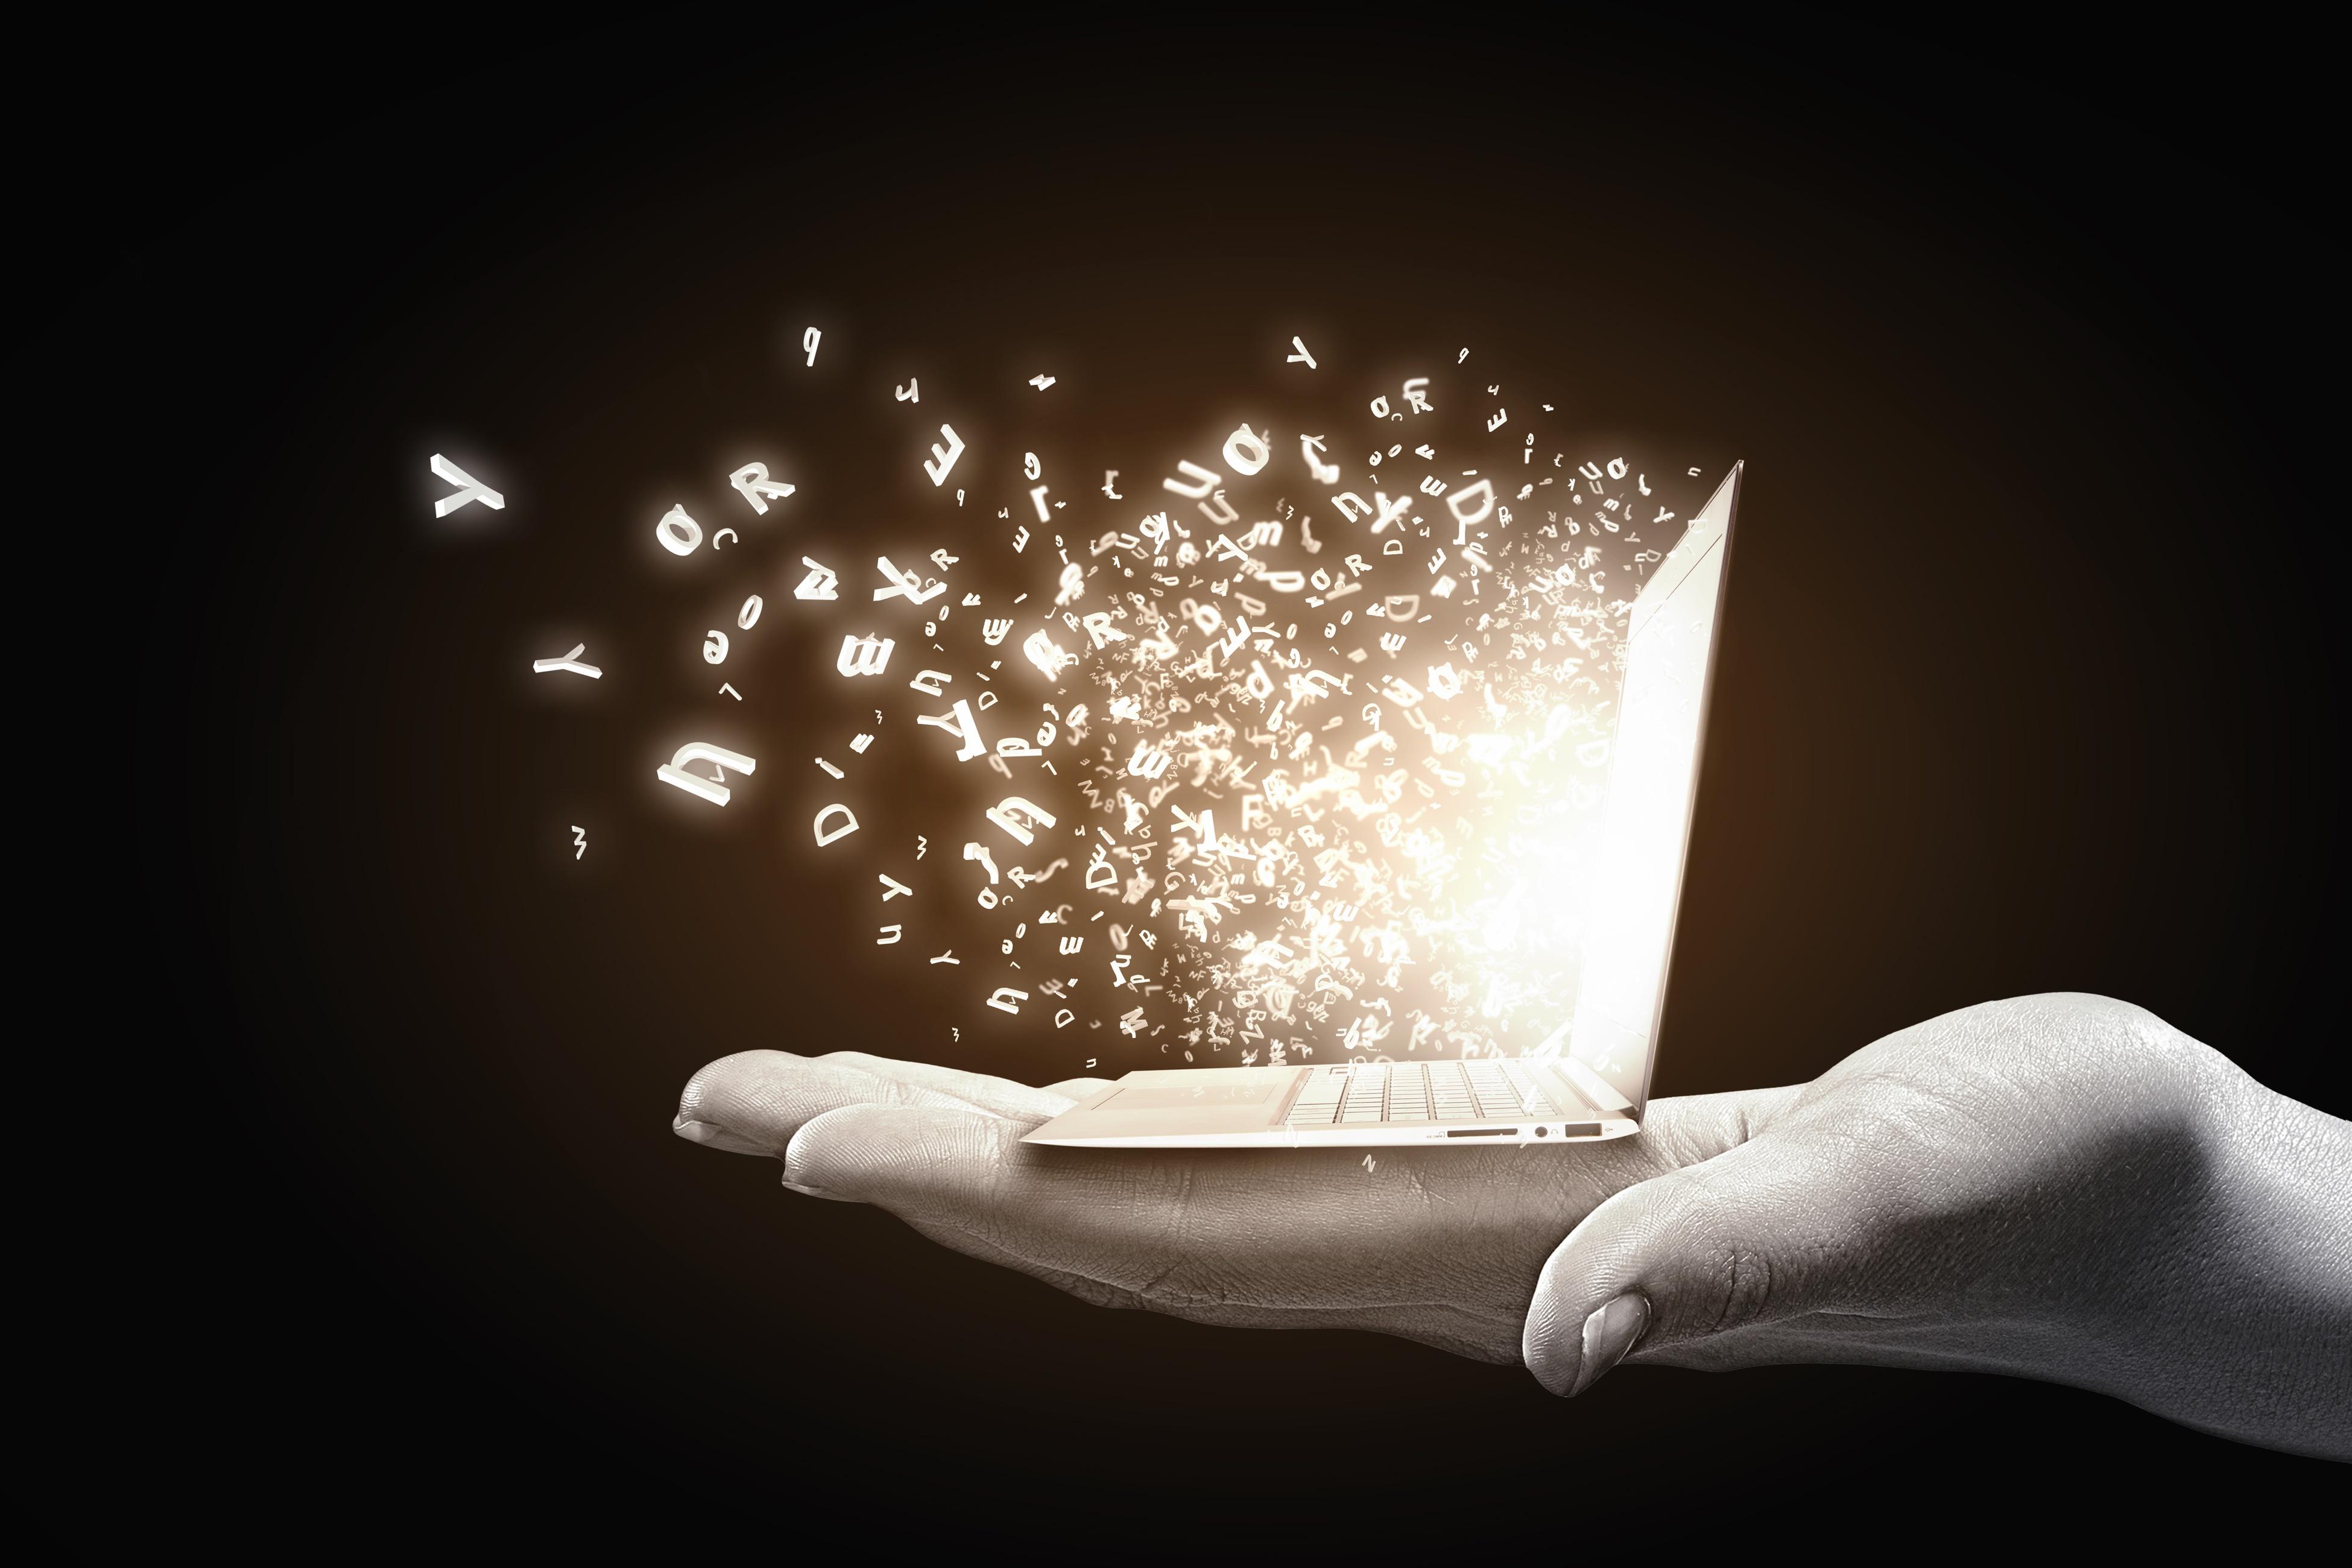 5-ideas-inspiradoras-para-tu-marketing-de-contenidos